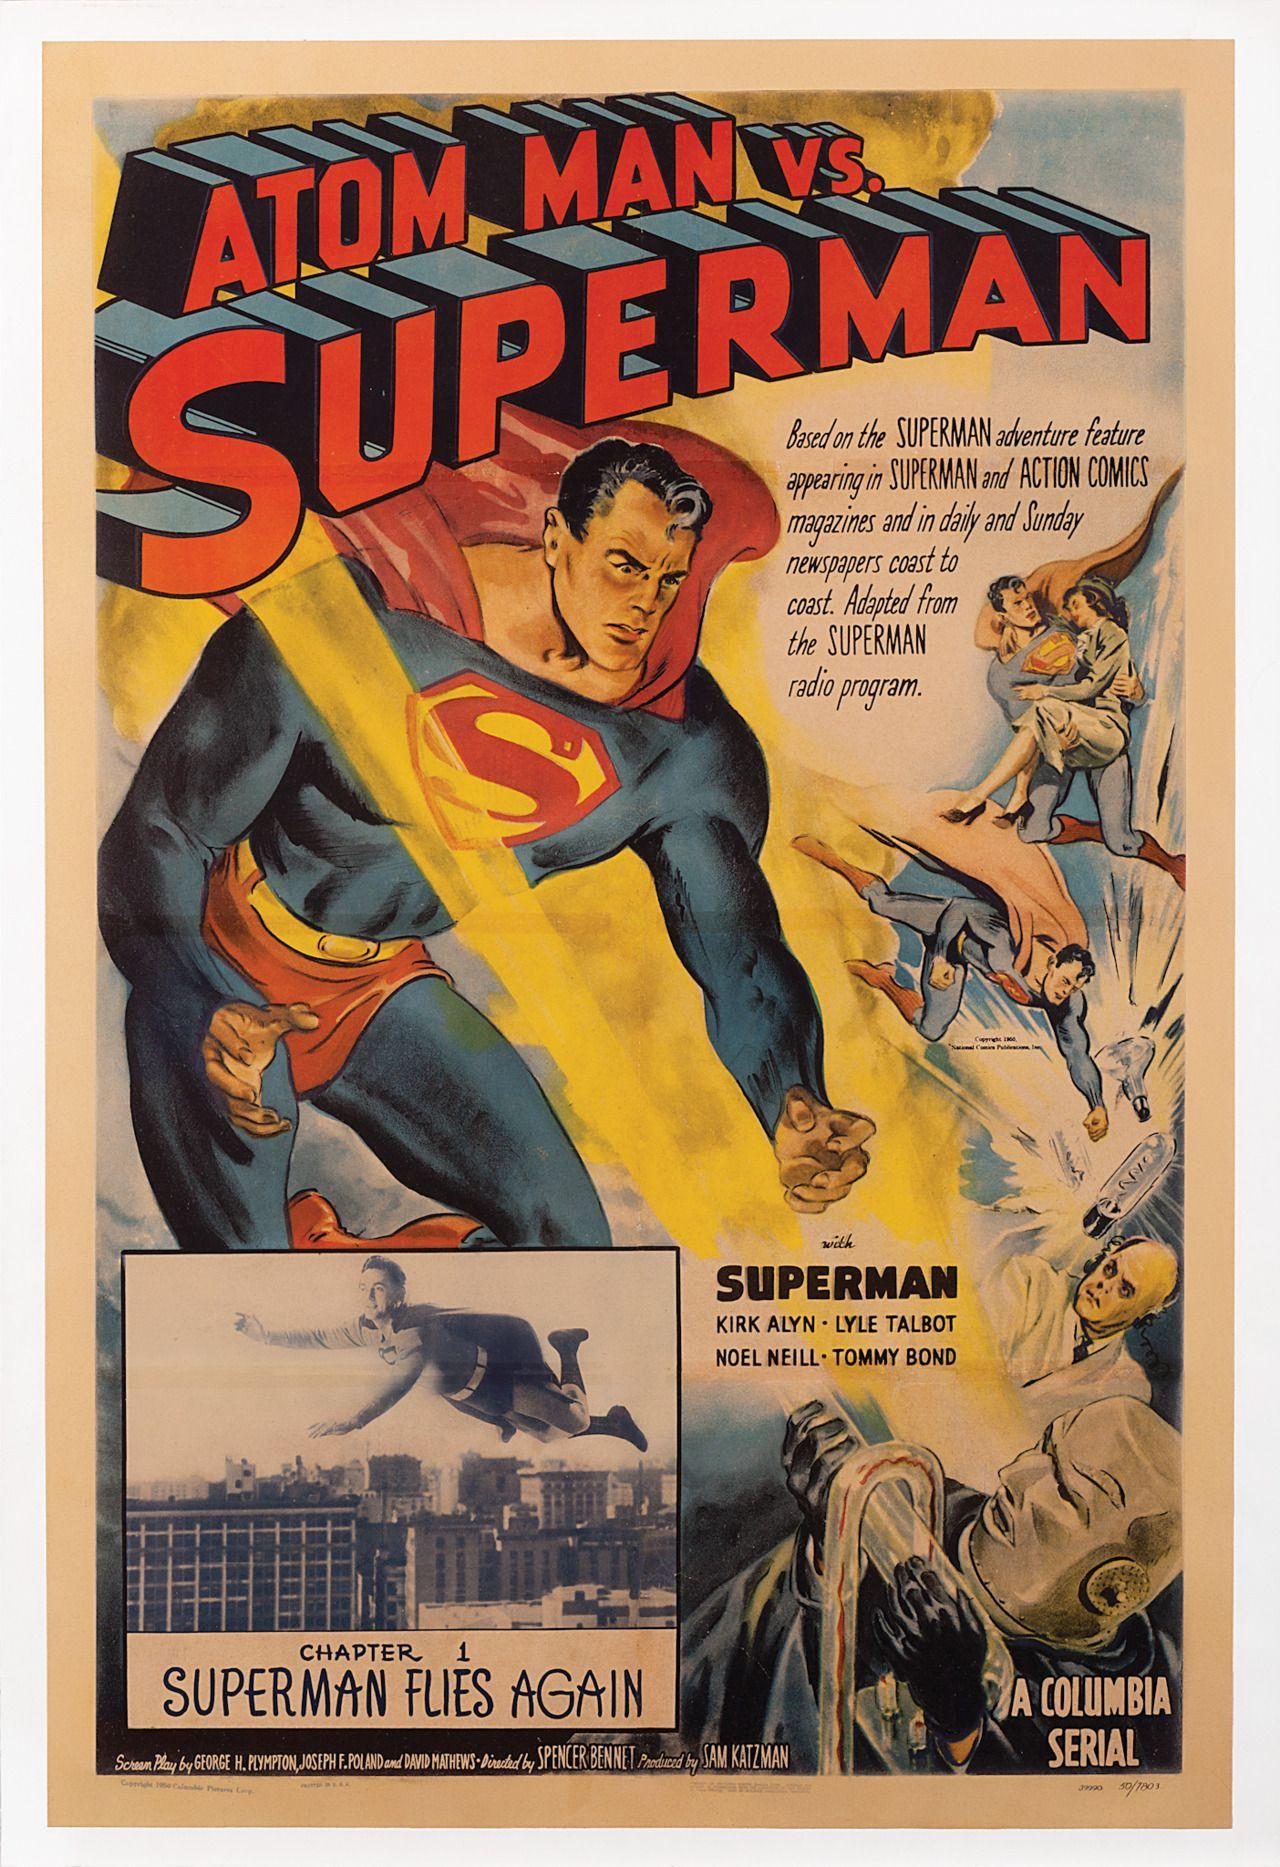 Atom Man vs Superman poster